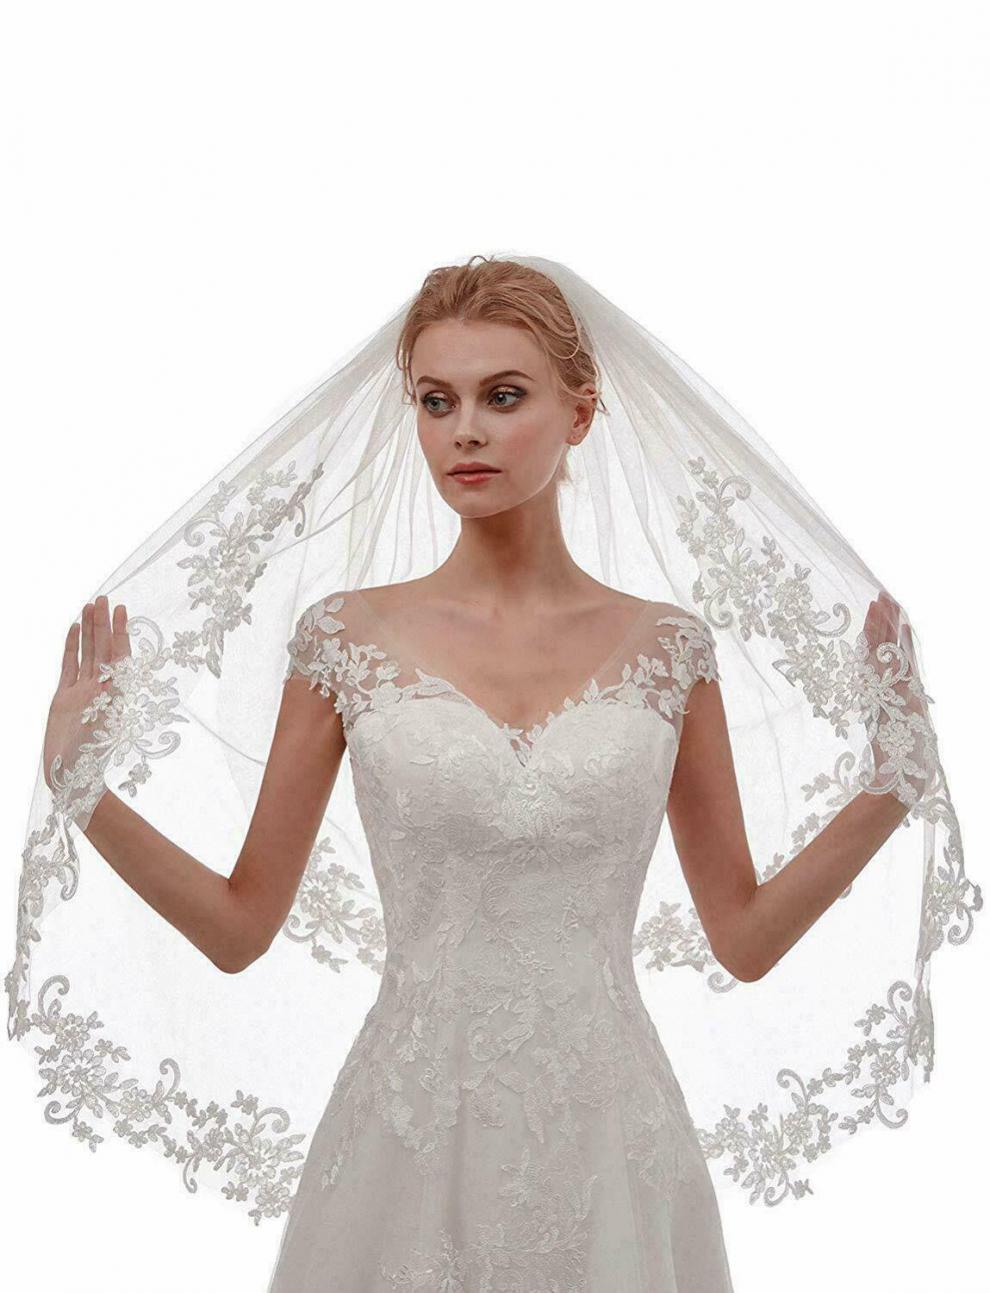 Short blanco marfil velo encaje borde 1 capa velos de boda Conjunto...